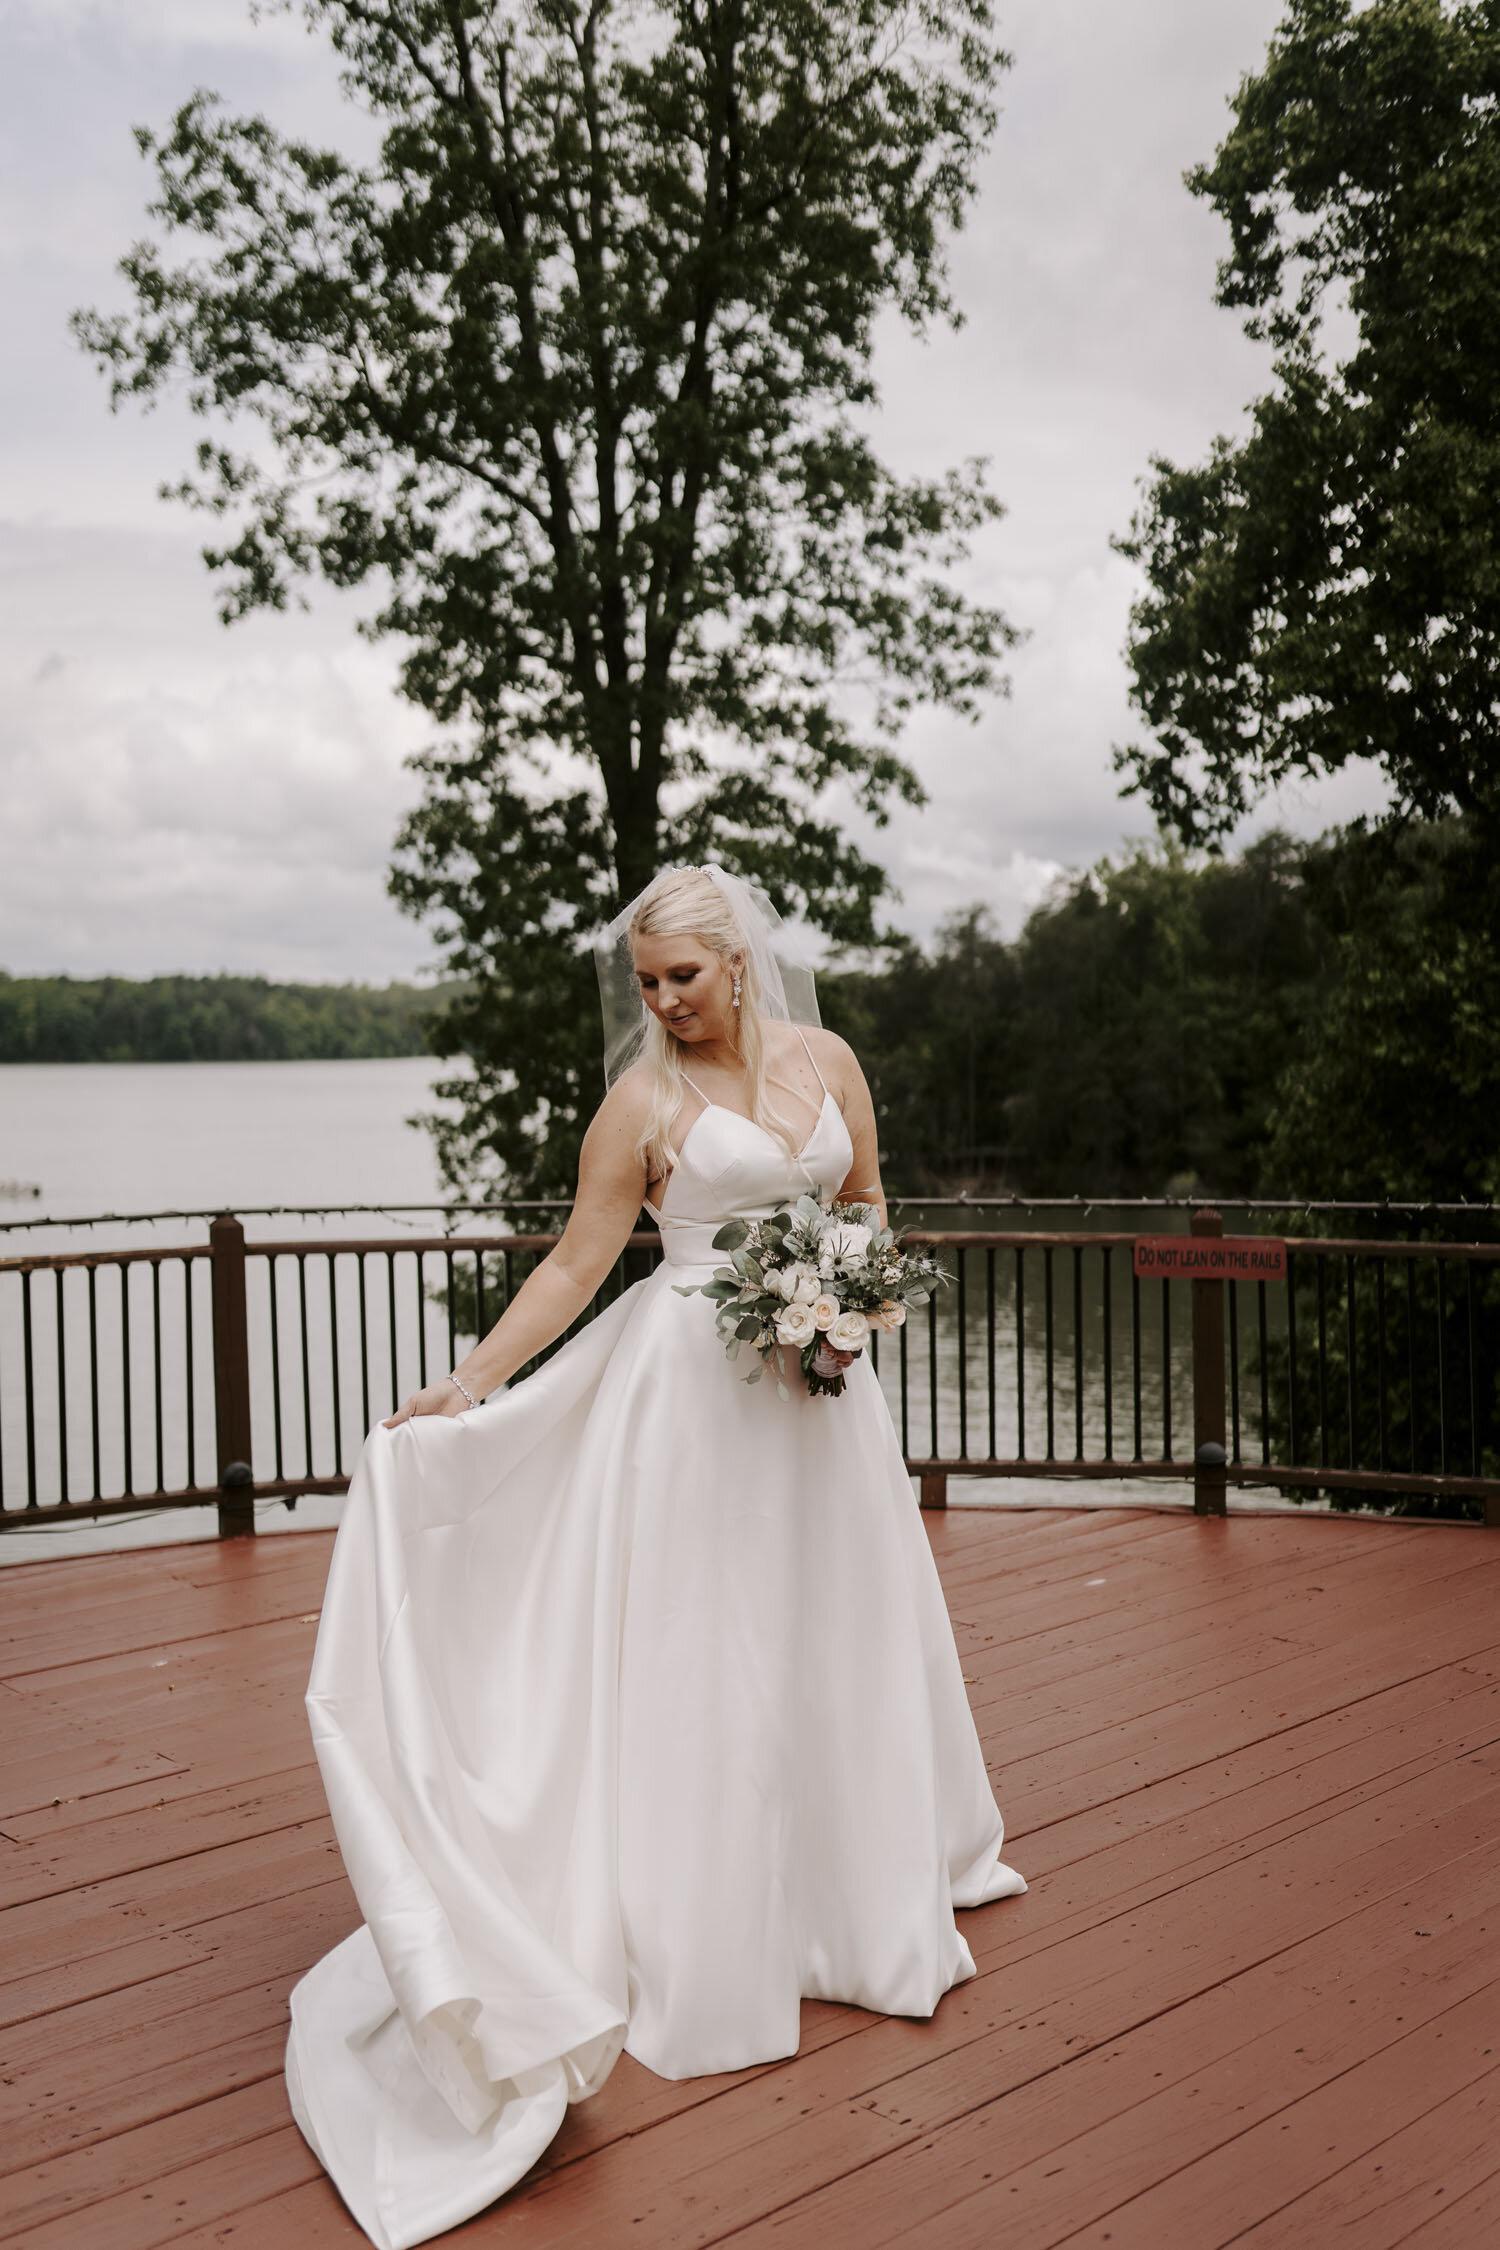 Bridal Portrait Session by Kayli LaFon Photography | Greensboro Winston-Salem NC Wedding Photographer